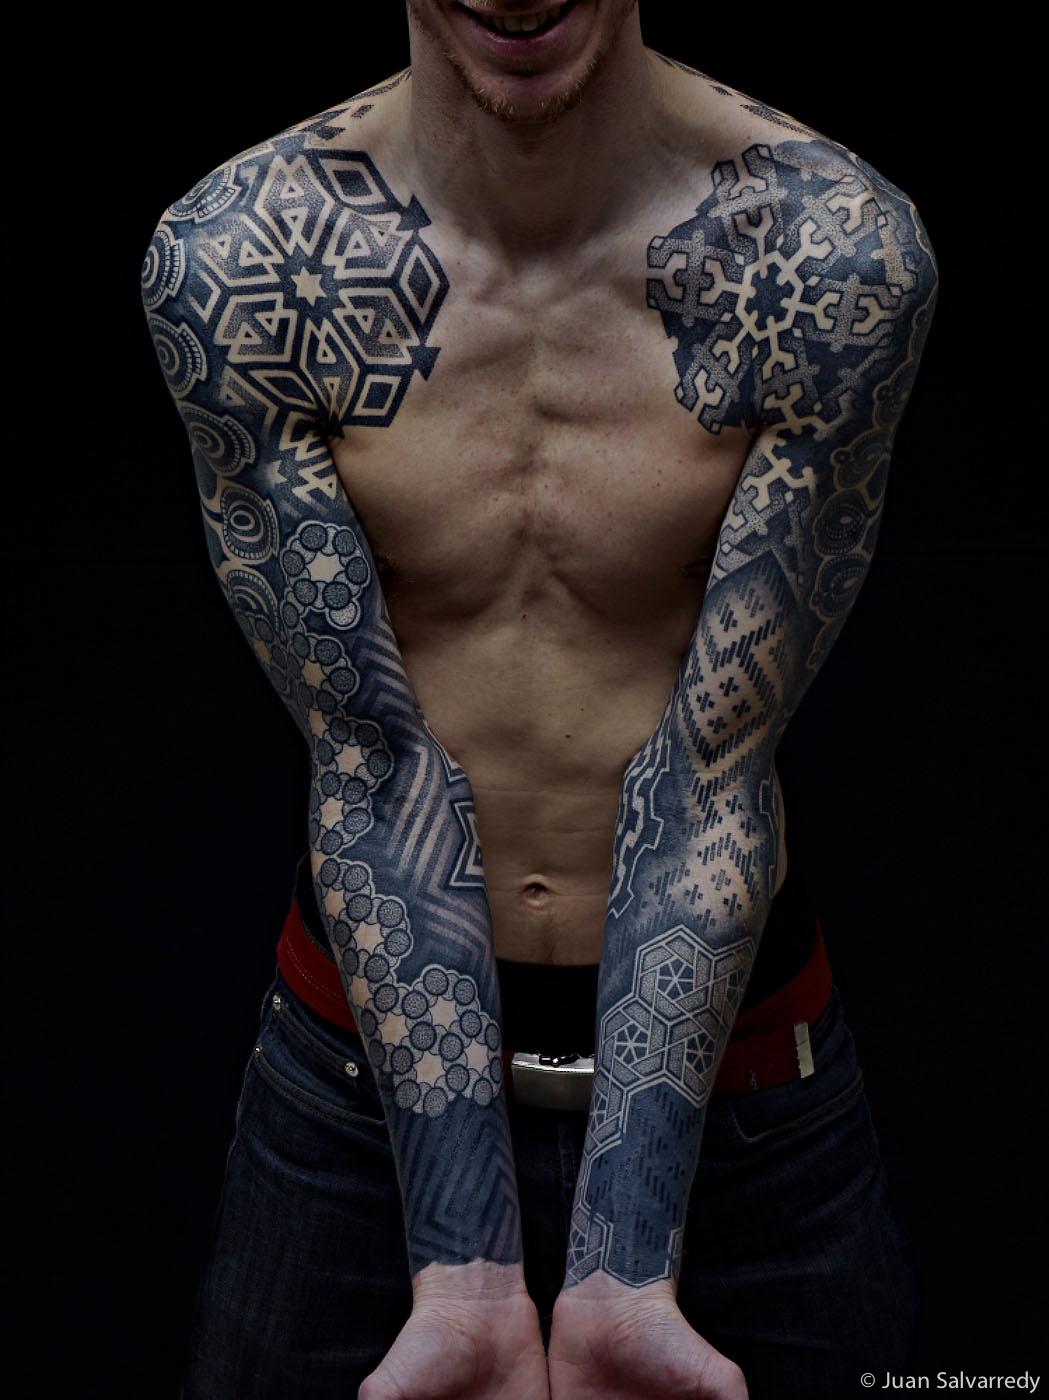 Guy Arm Tattoos